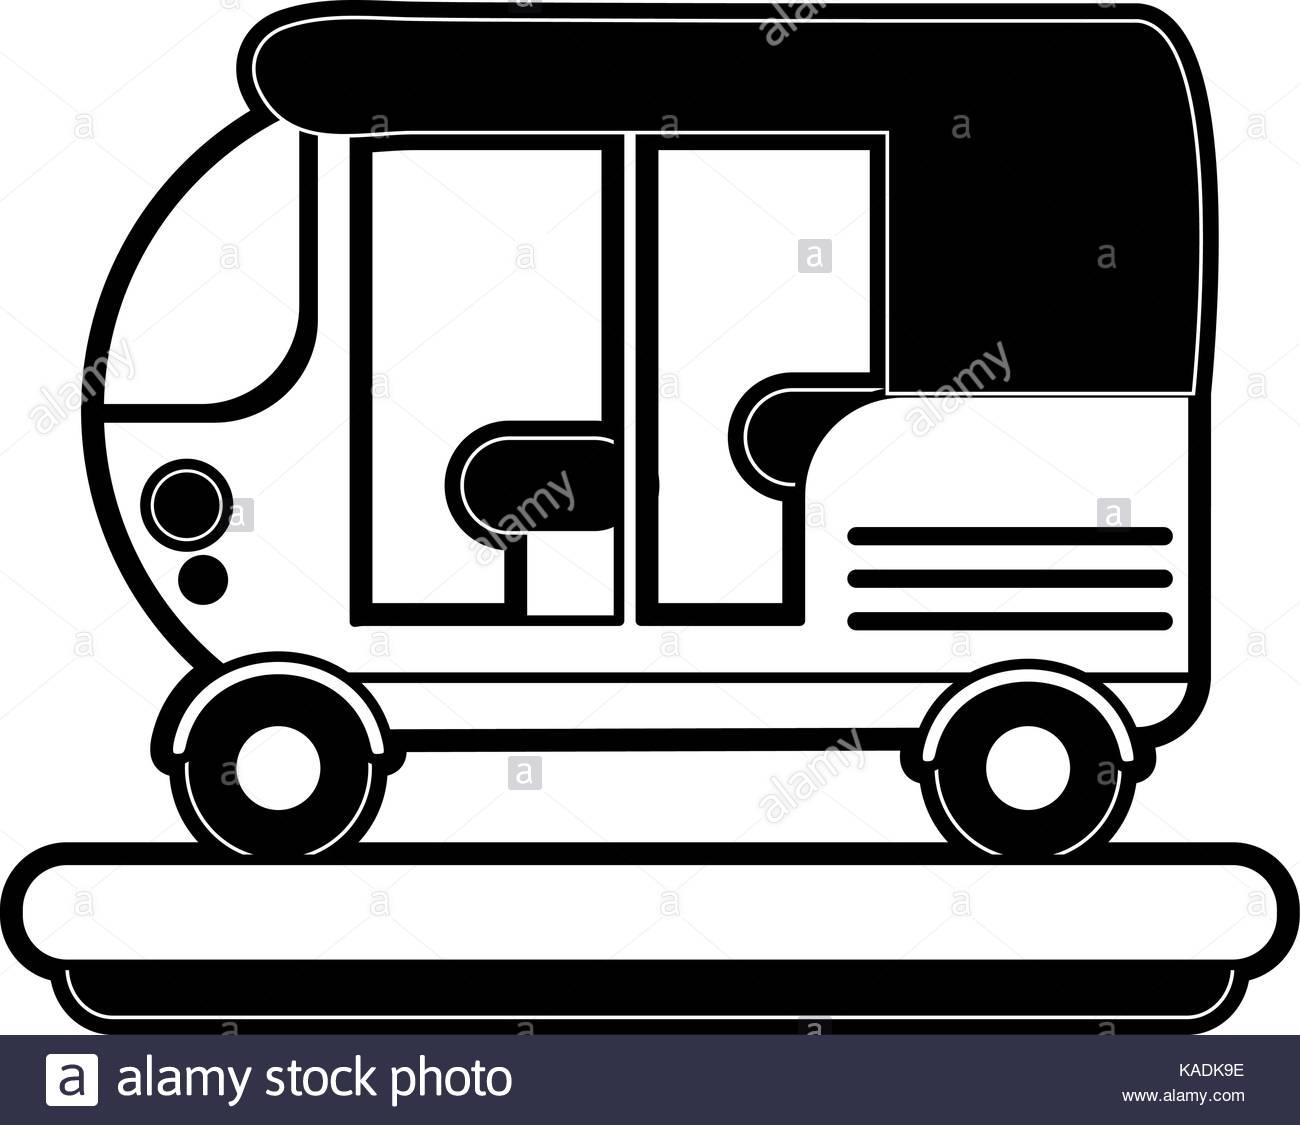 Auto Rickshaw Black and White Stock Photos & Images.